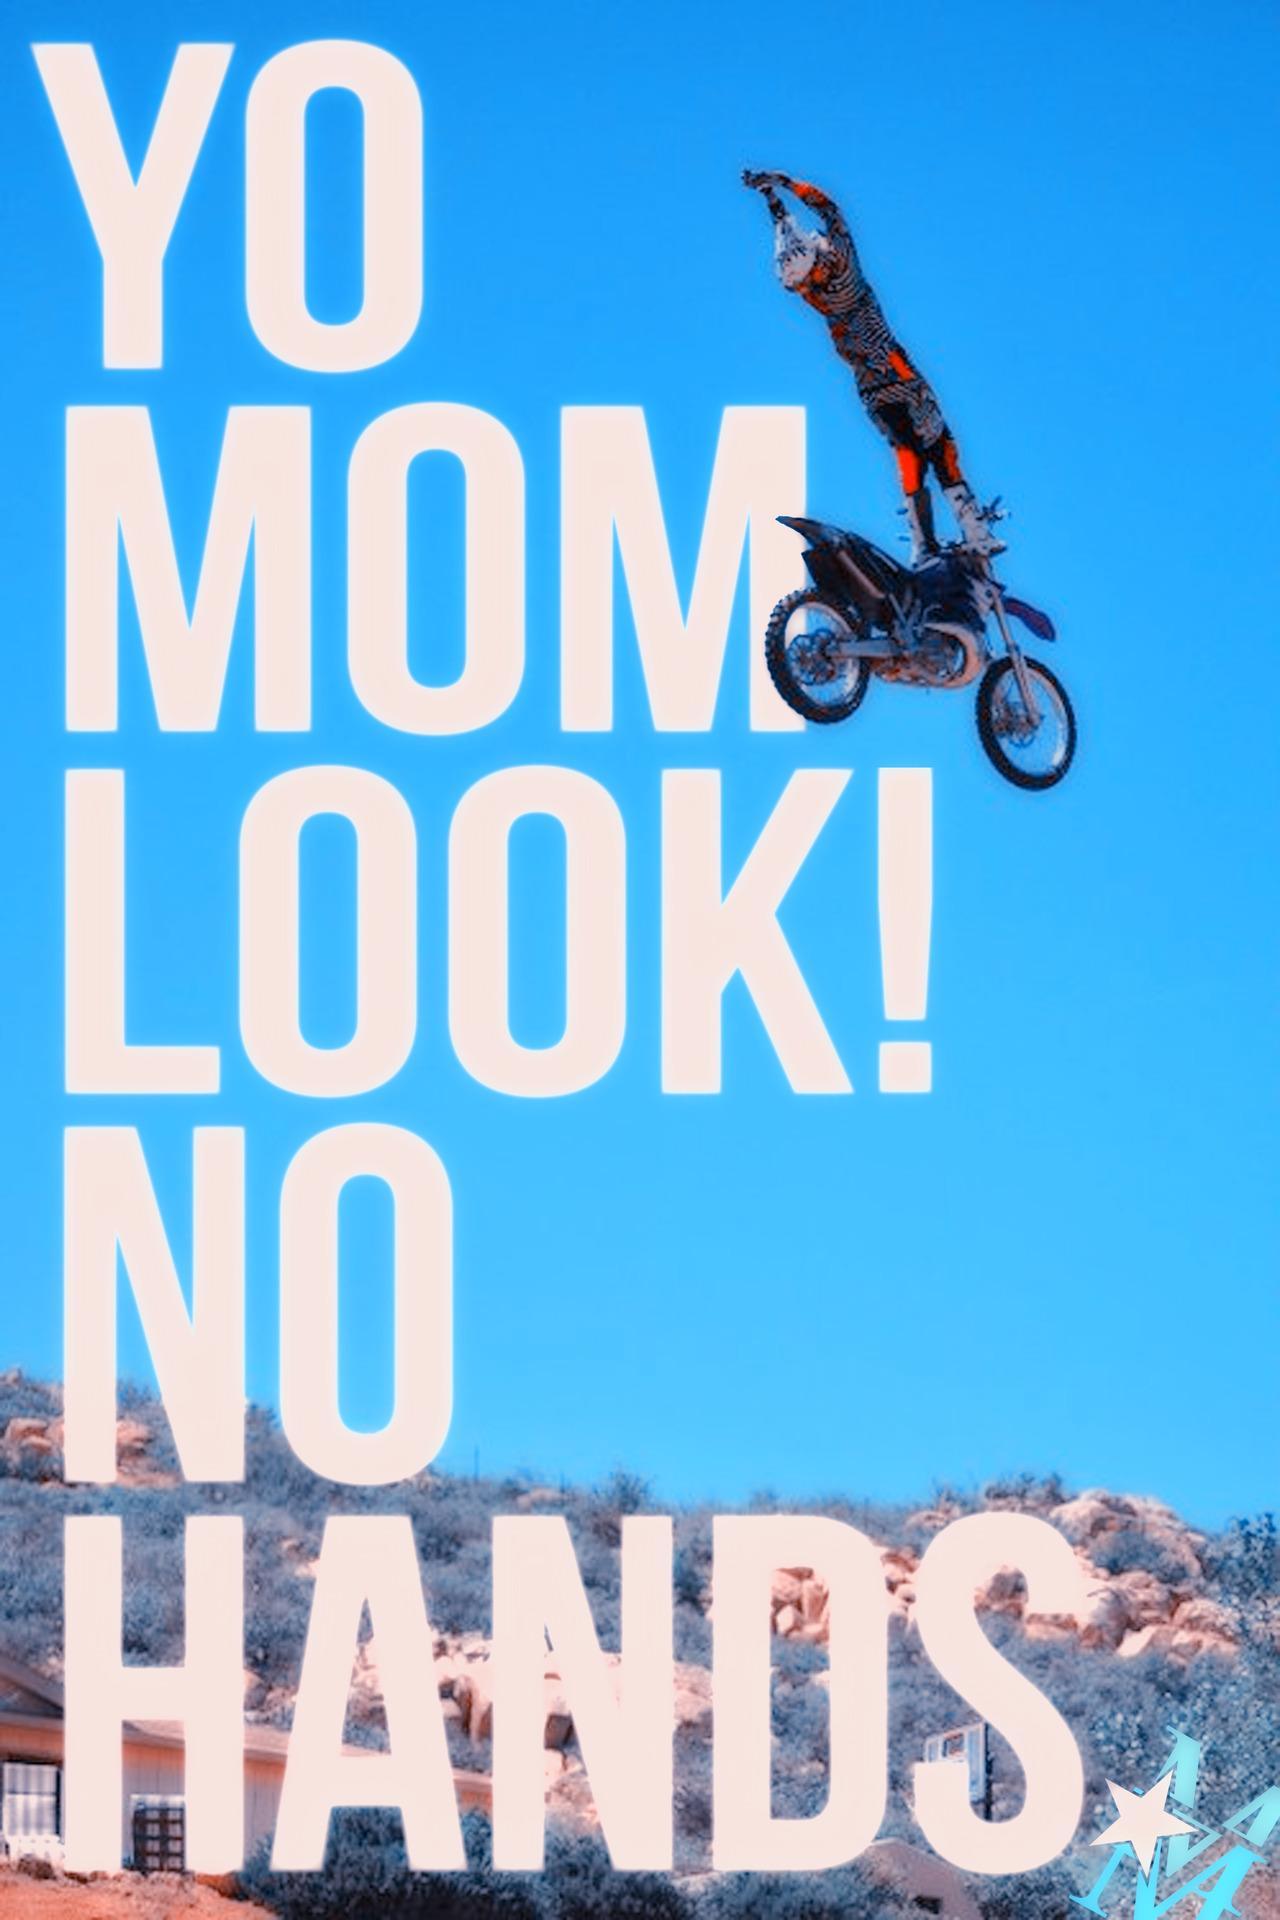 Funny Motocross Quotes. QuotesGram